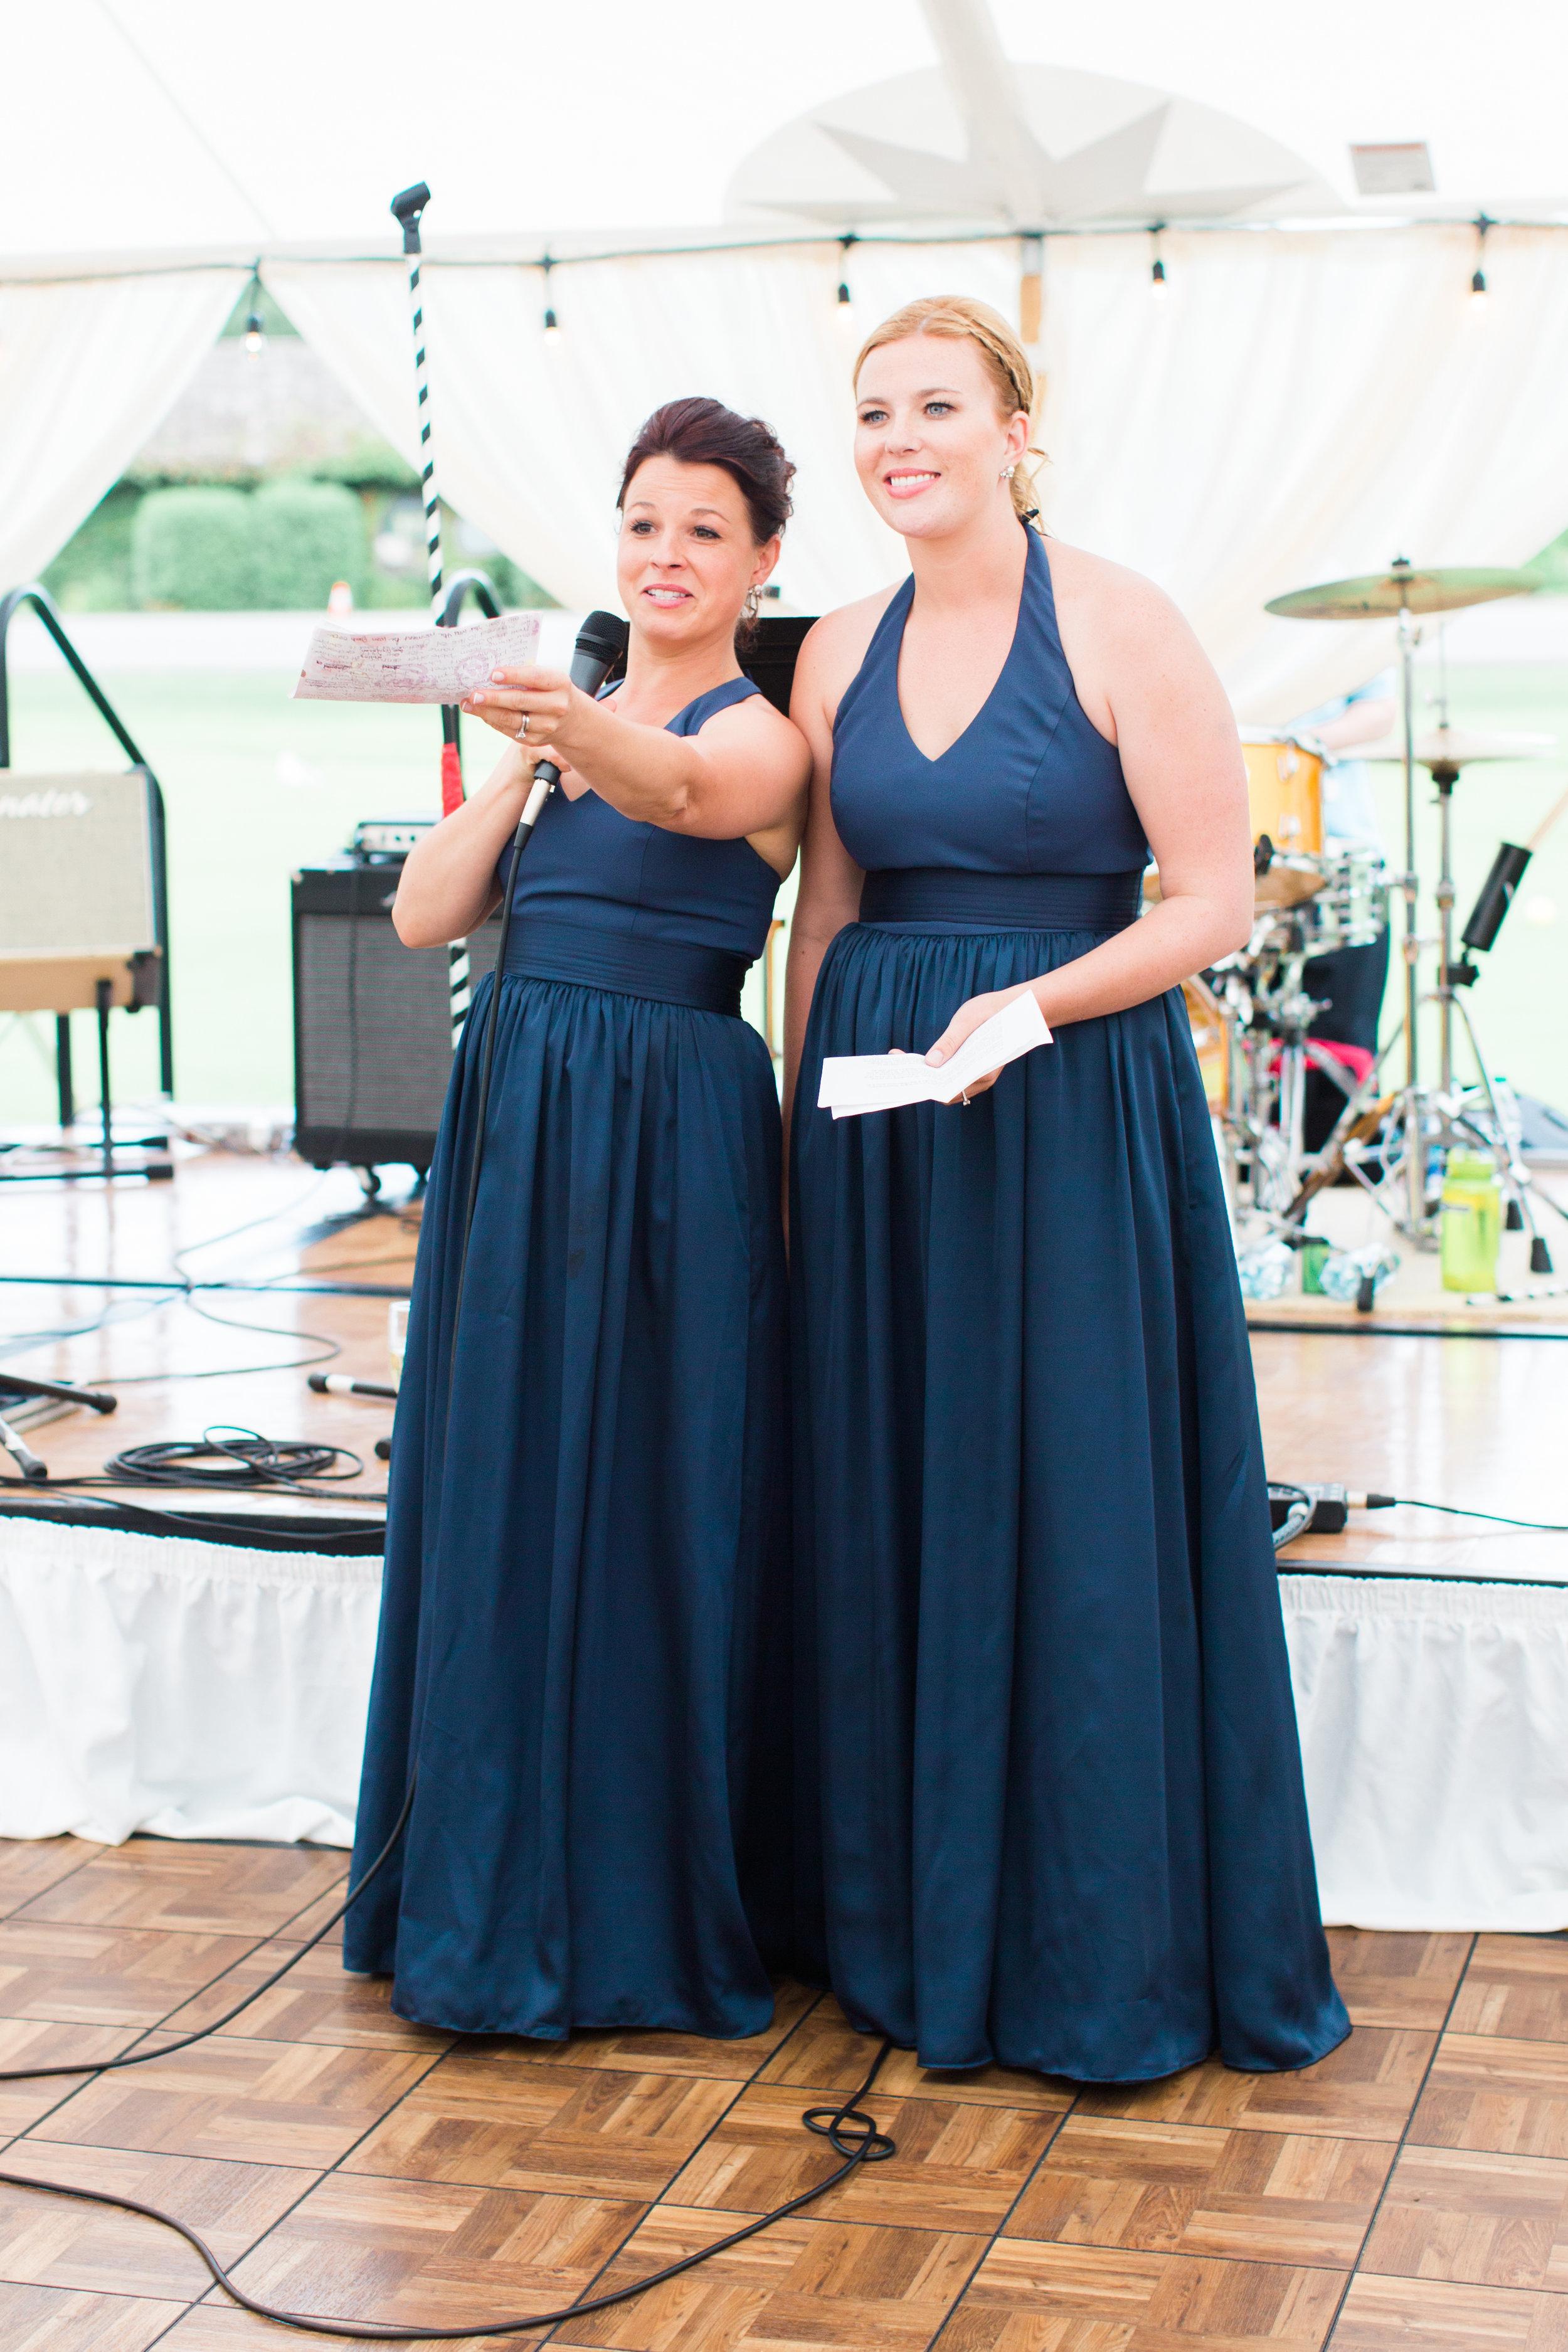 Kraft+Wedding+Reception+Toasts-43.jpg